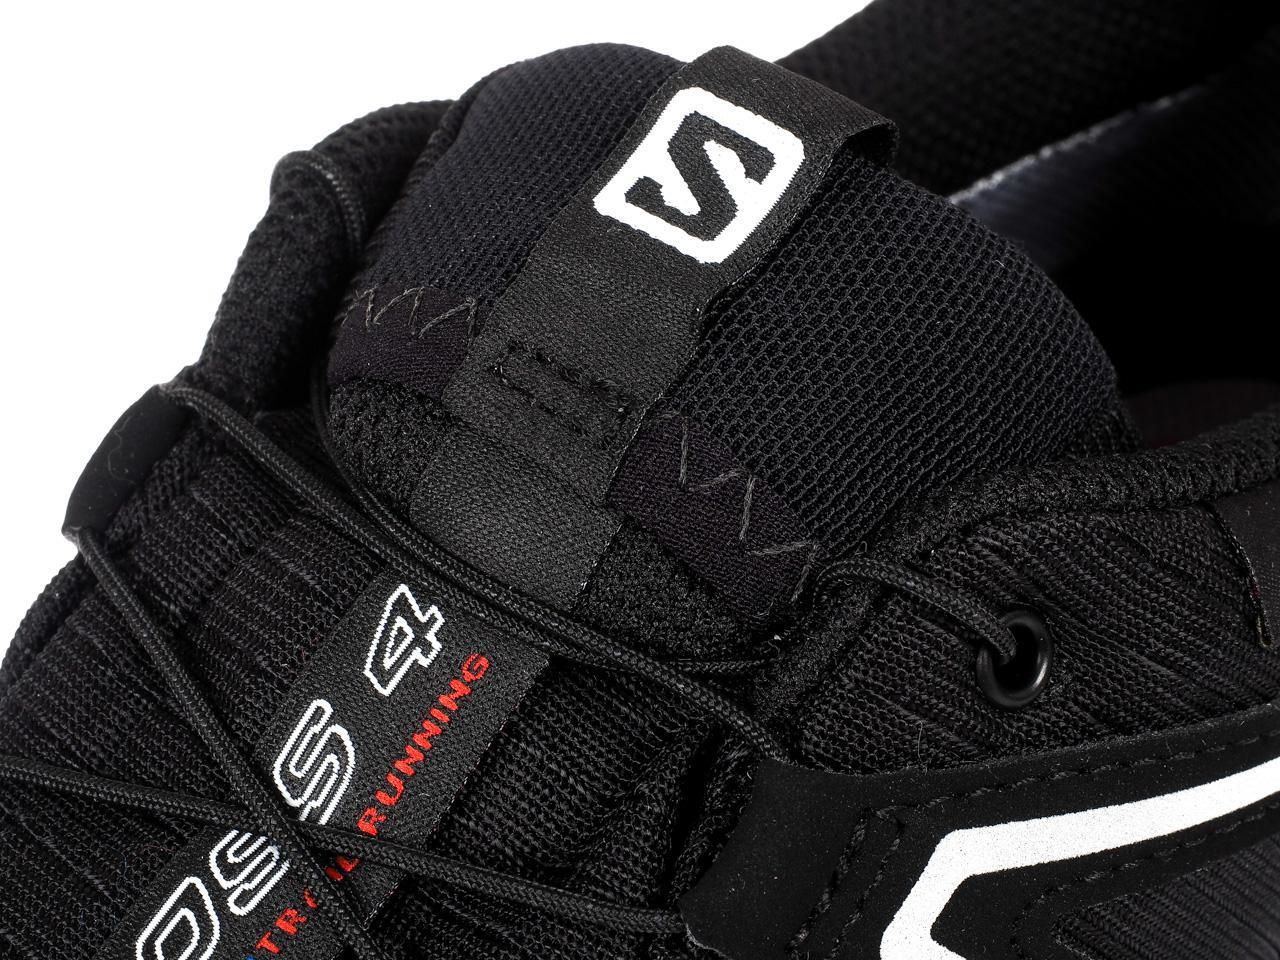 Zapatos-Running-Rastro-Salomon-Speed-Cross-4-GTX-Nr-Run-Negro-24186-Nuevo miniatura 2